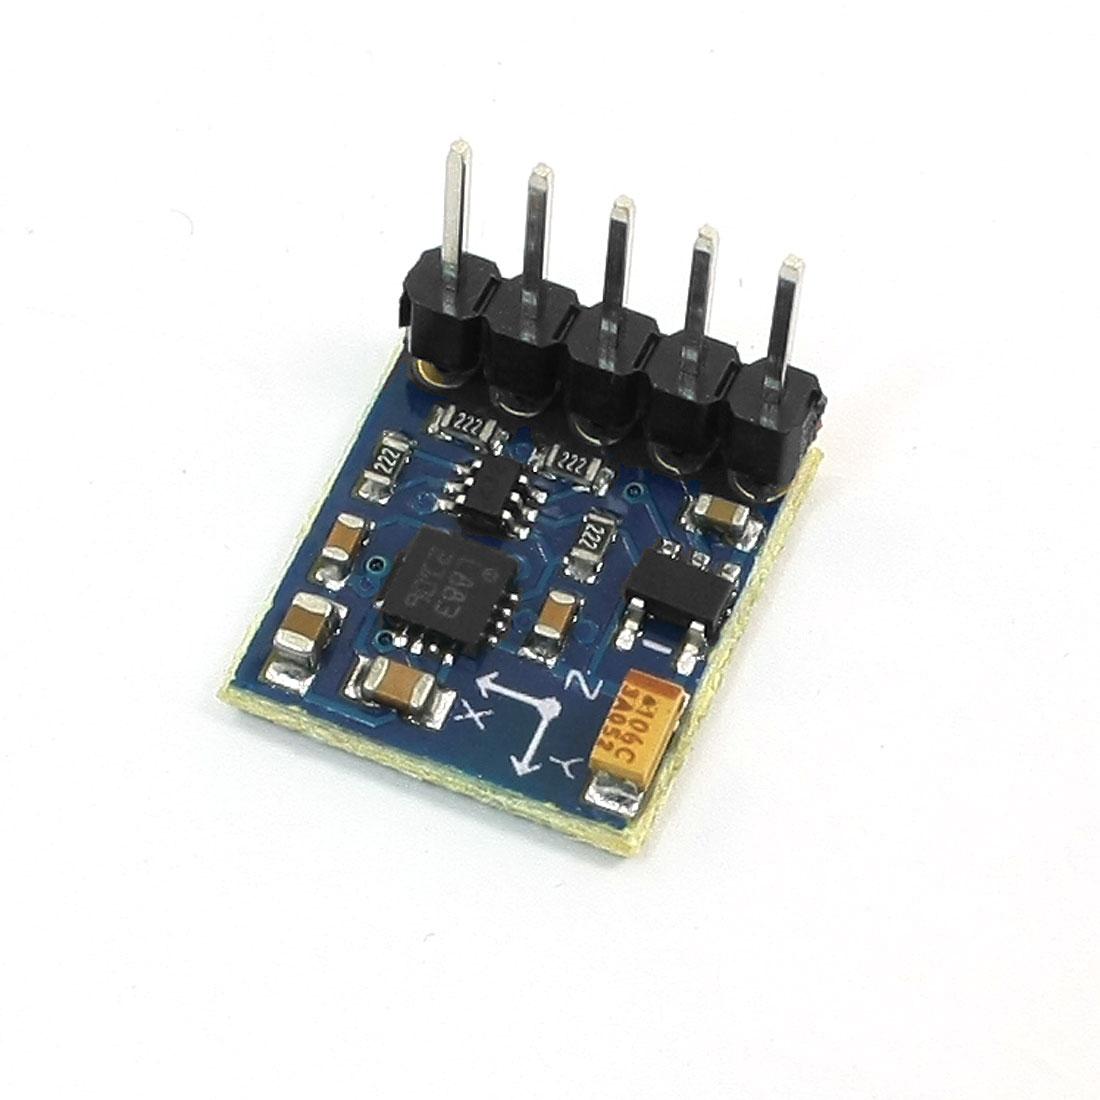 GY-271 3.3-5V HMC5883L 3-Axis Compass Module Blue